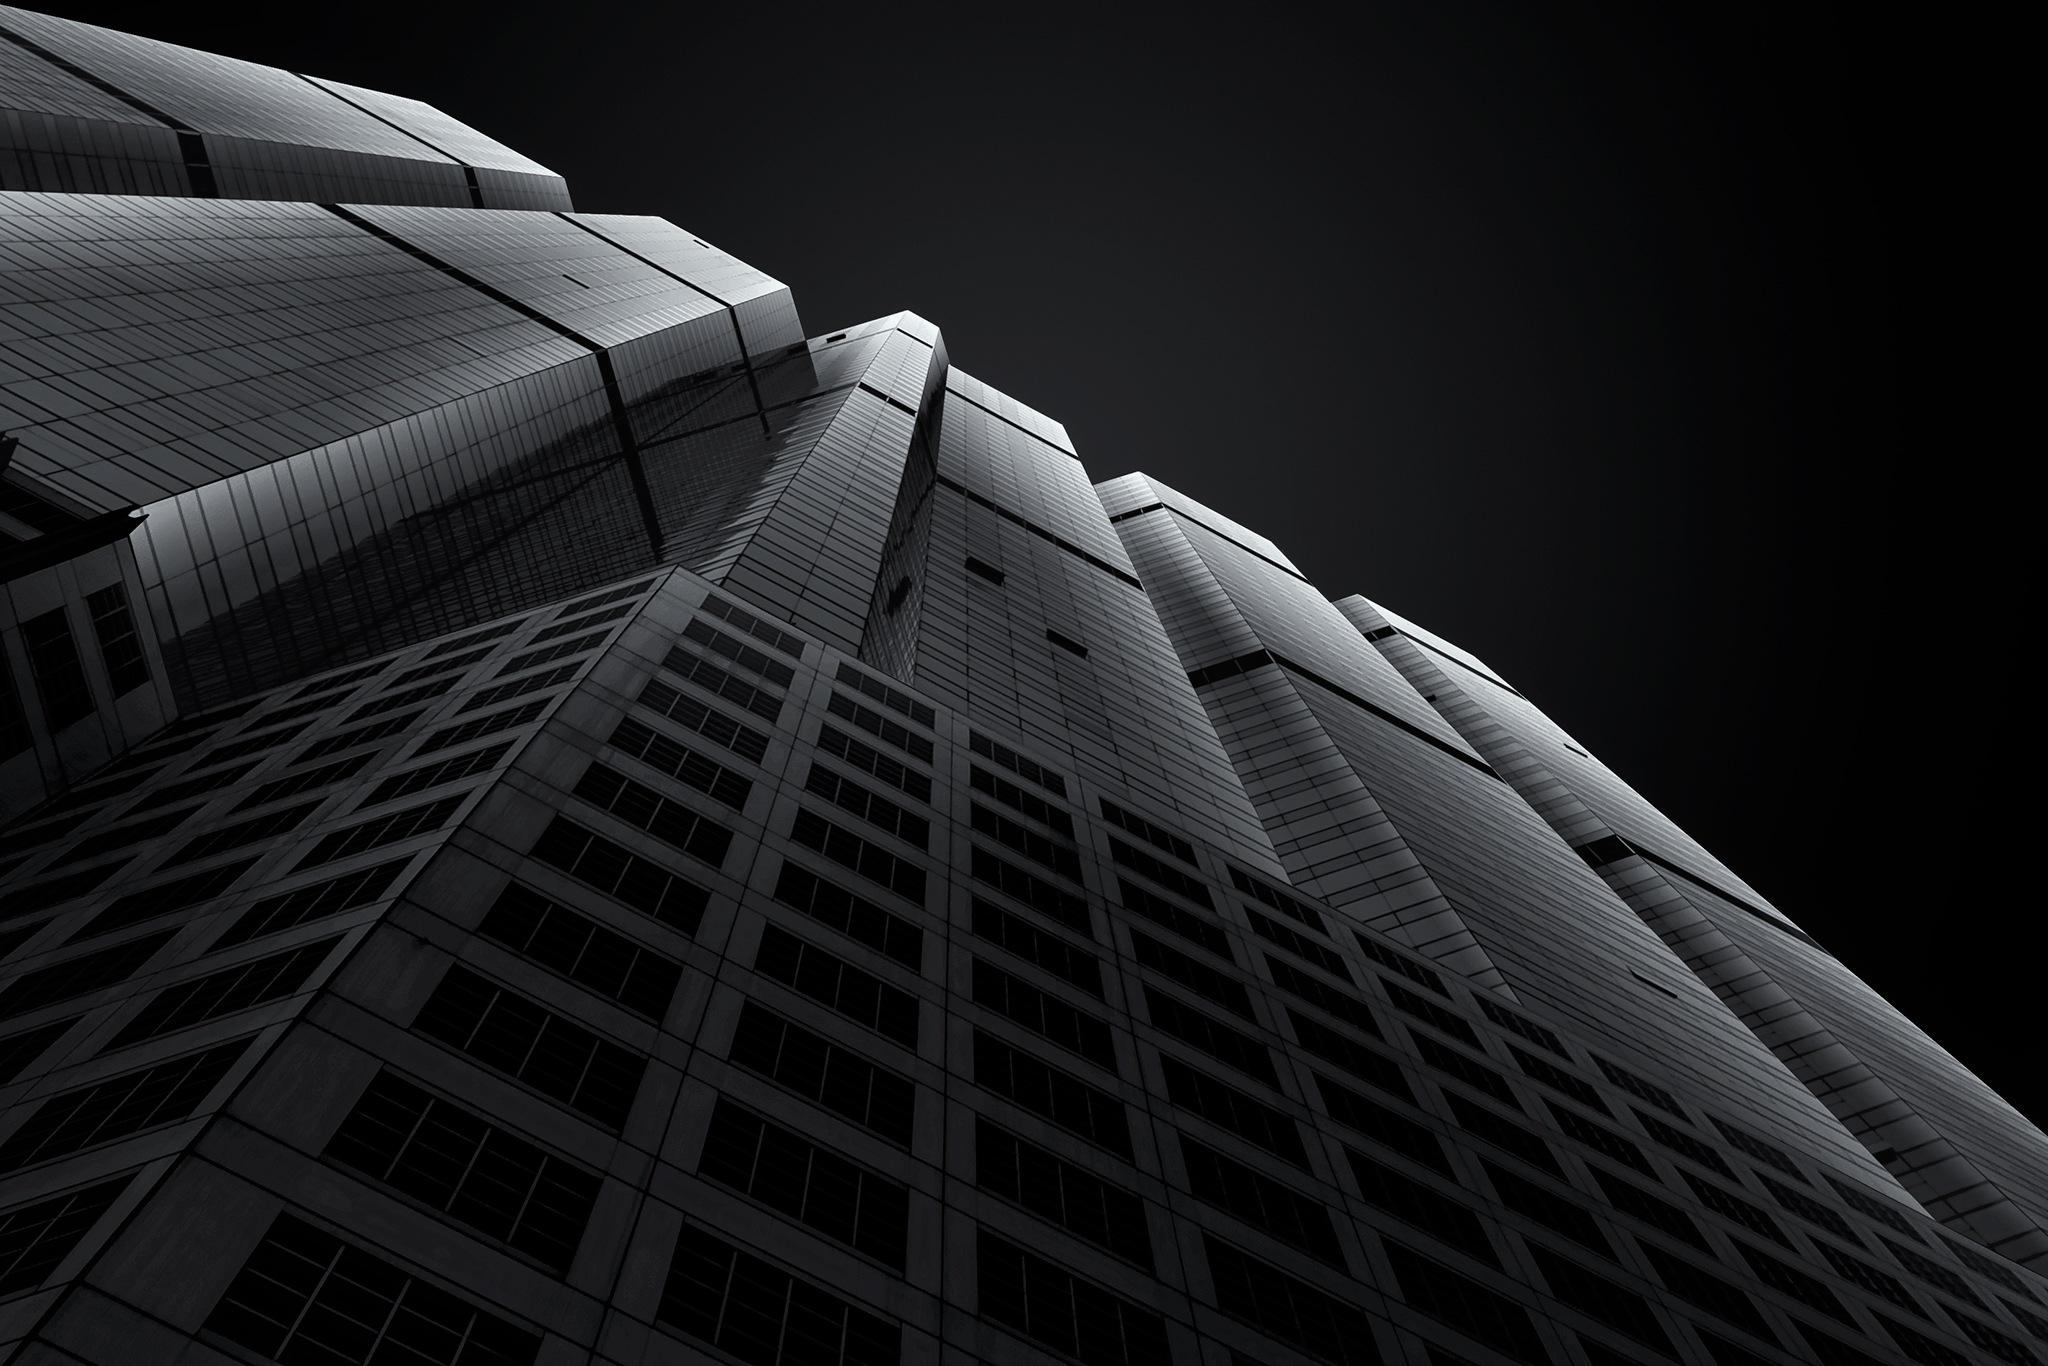 *Urbanisation* by GManita